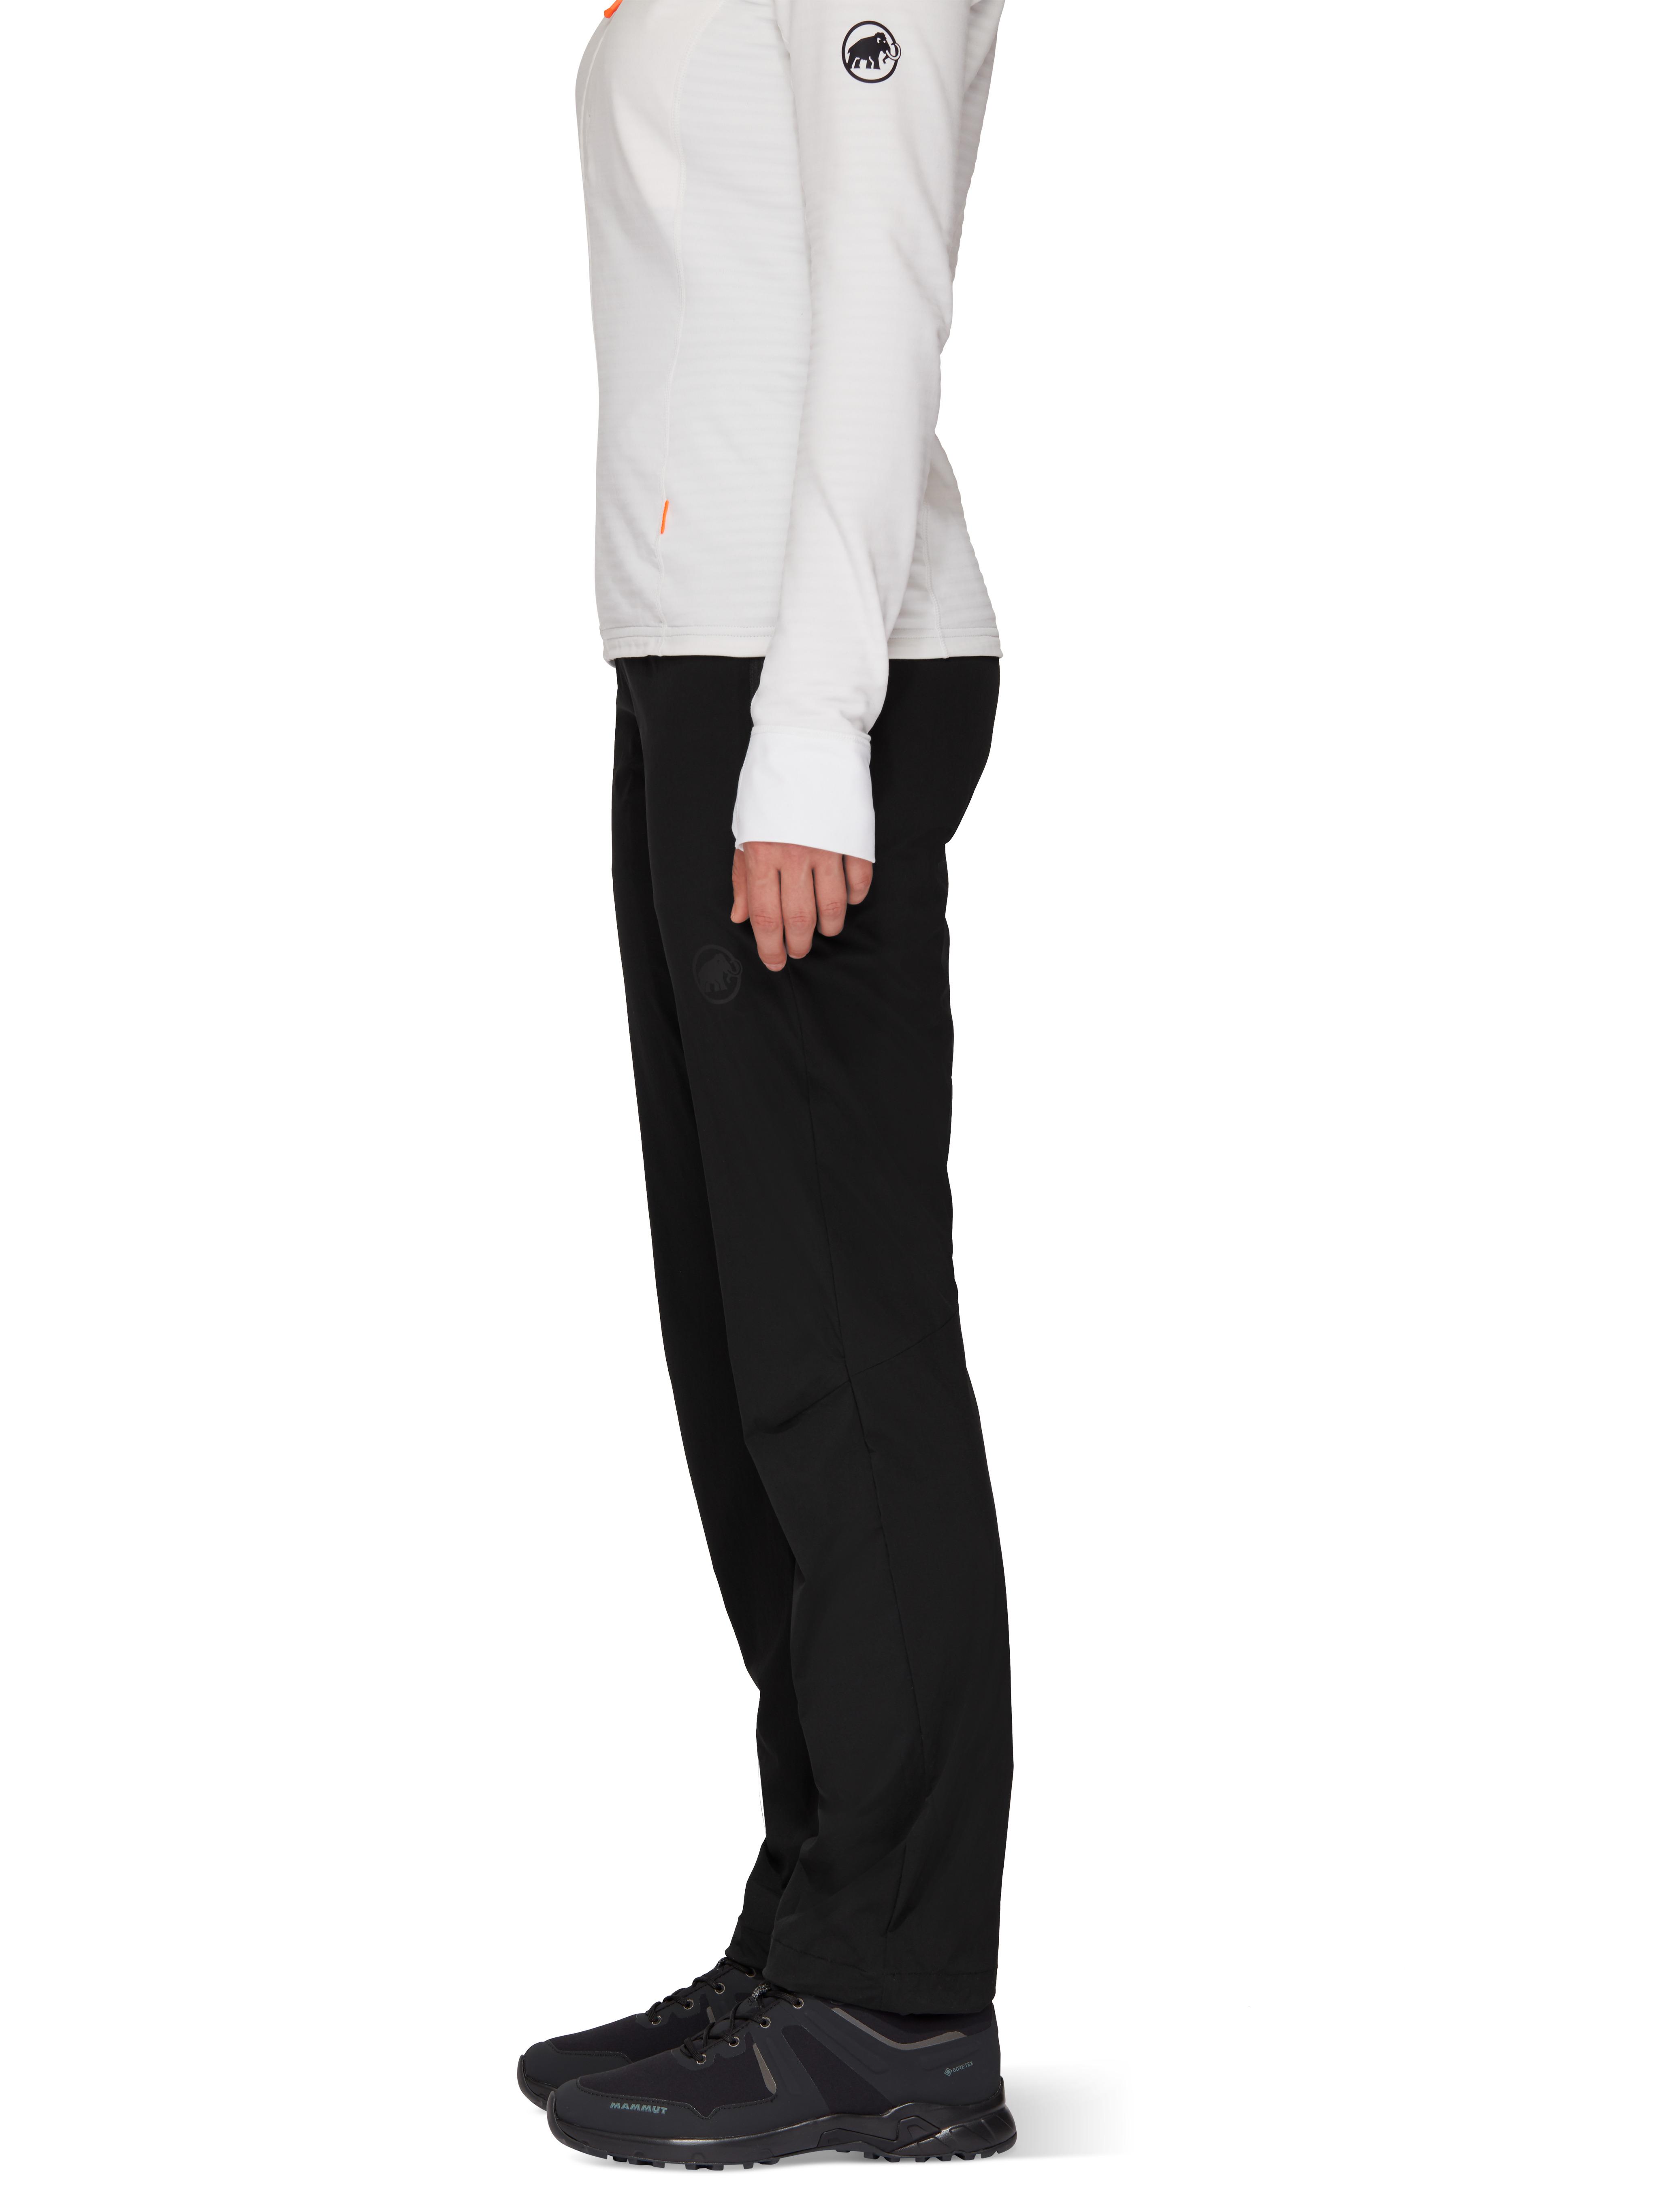 Runbold Light Pants Women product image